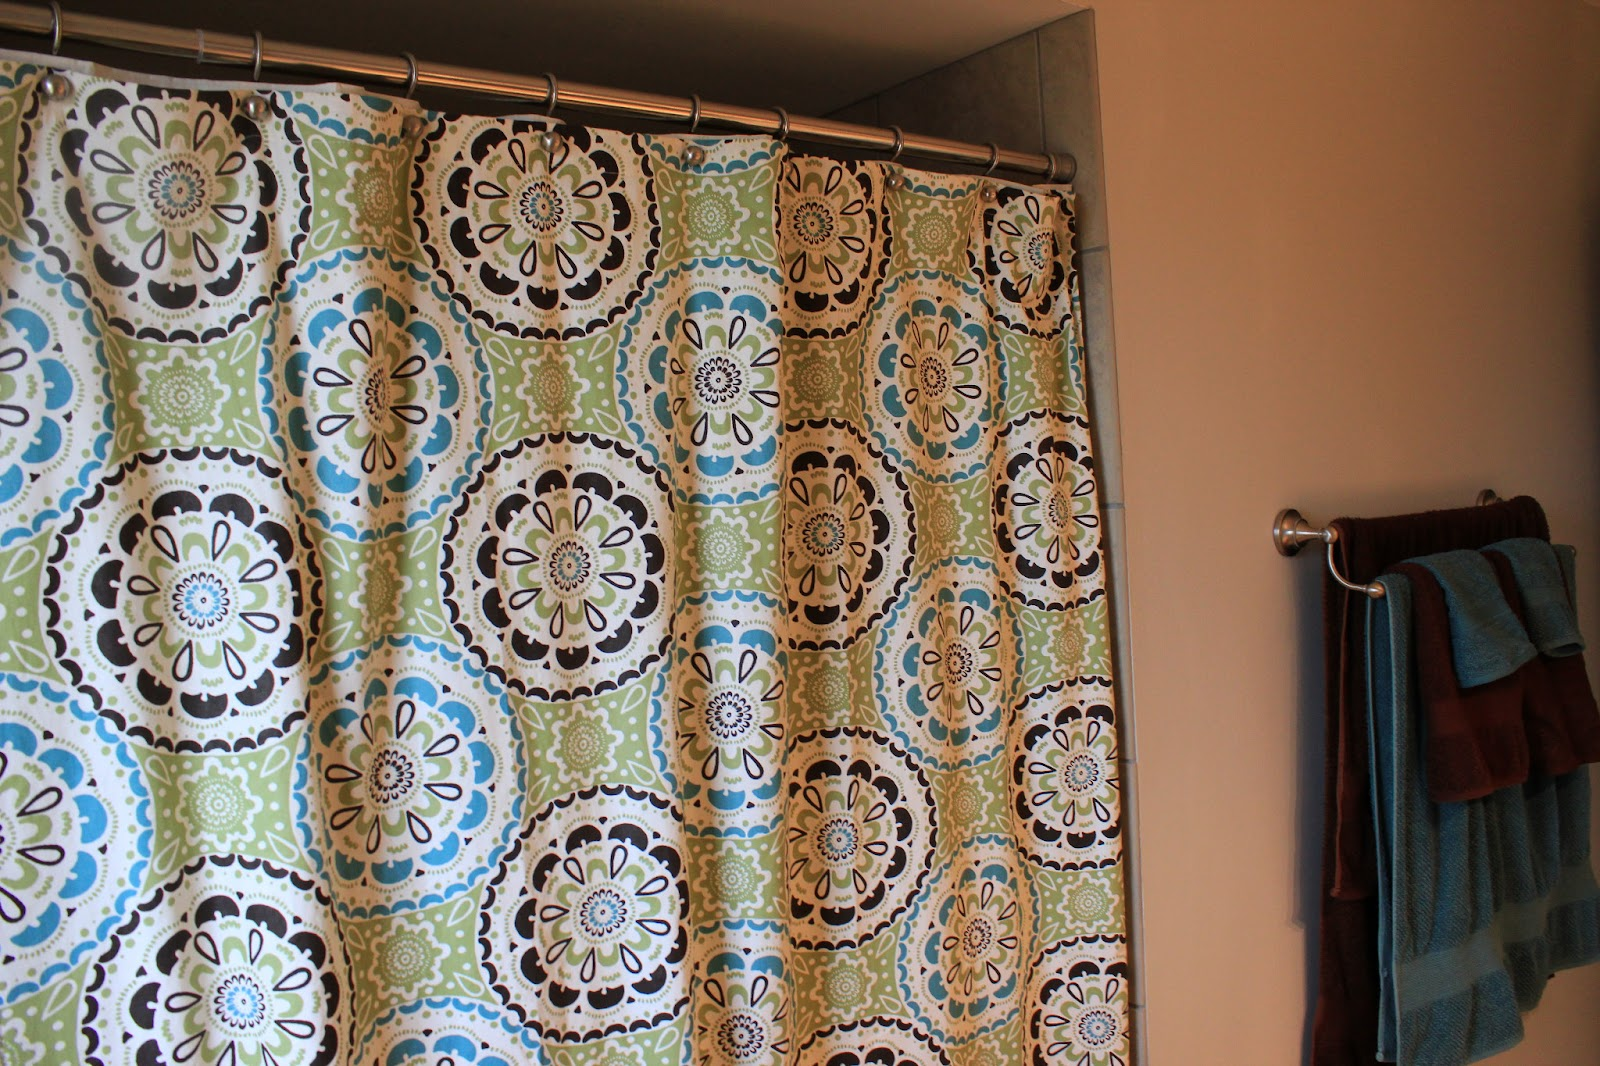 Breezy Pink Daisies: My Shower Curtain Saga - Shower Curtain #4 in ...